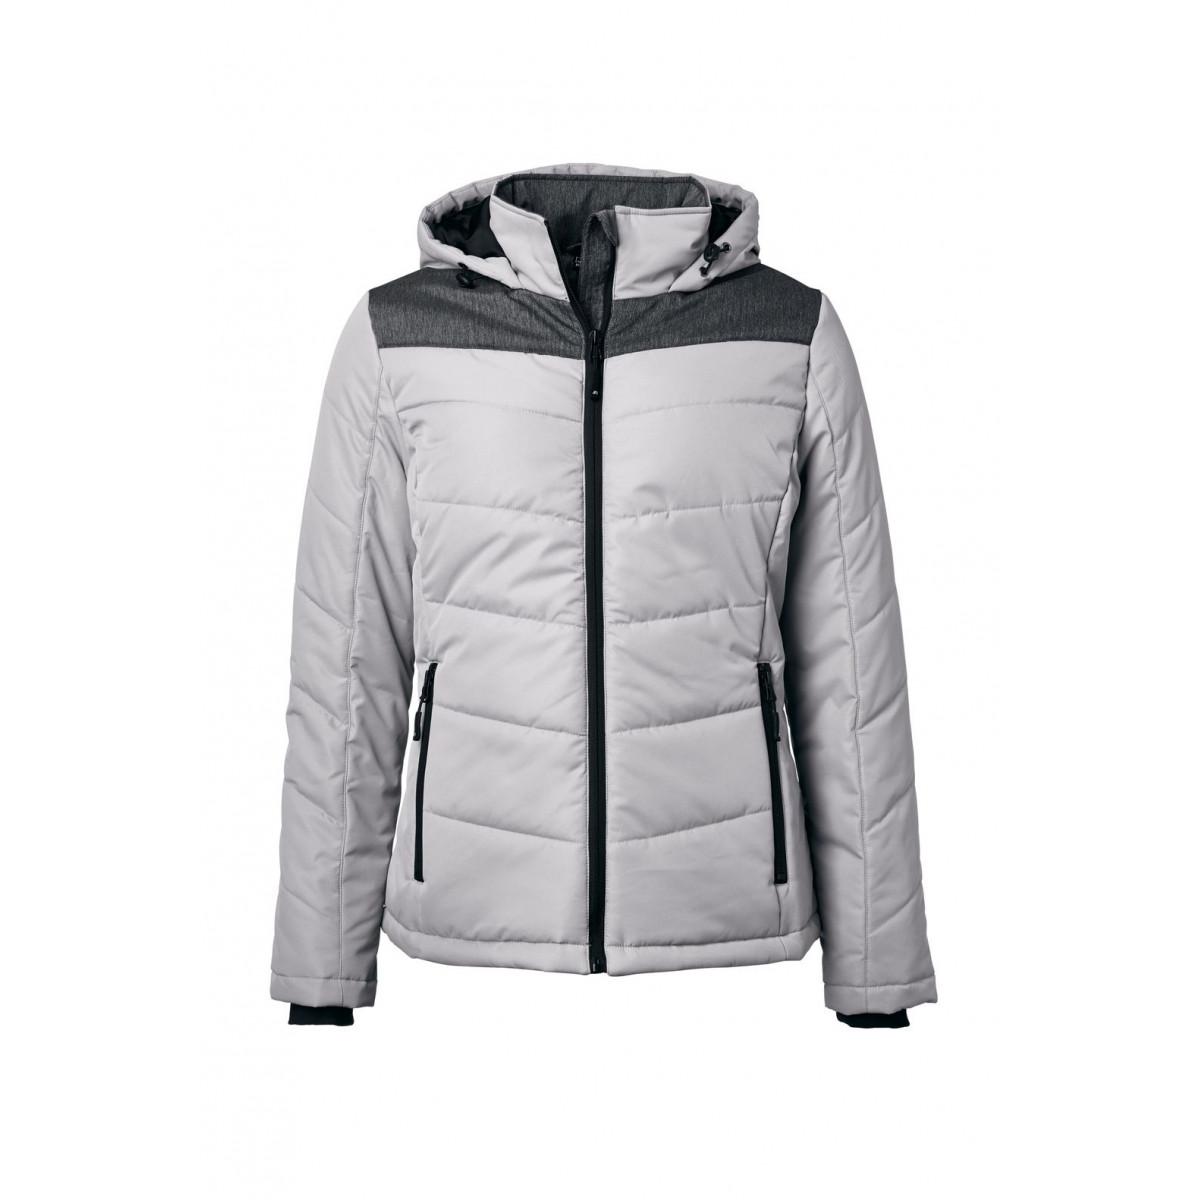 Куртка женская JN1133 Ladies Winter Jacket - Серебряный/Темно-серый меланж